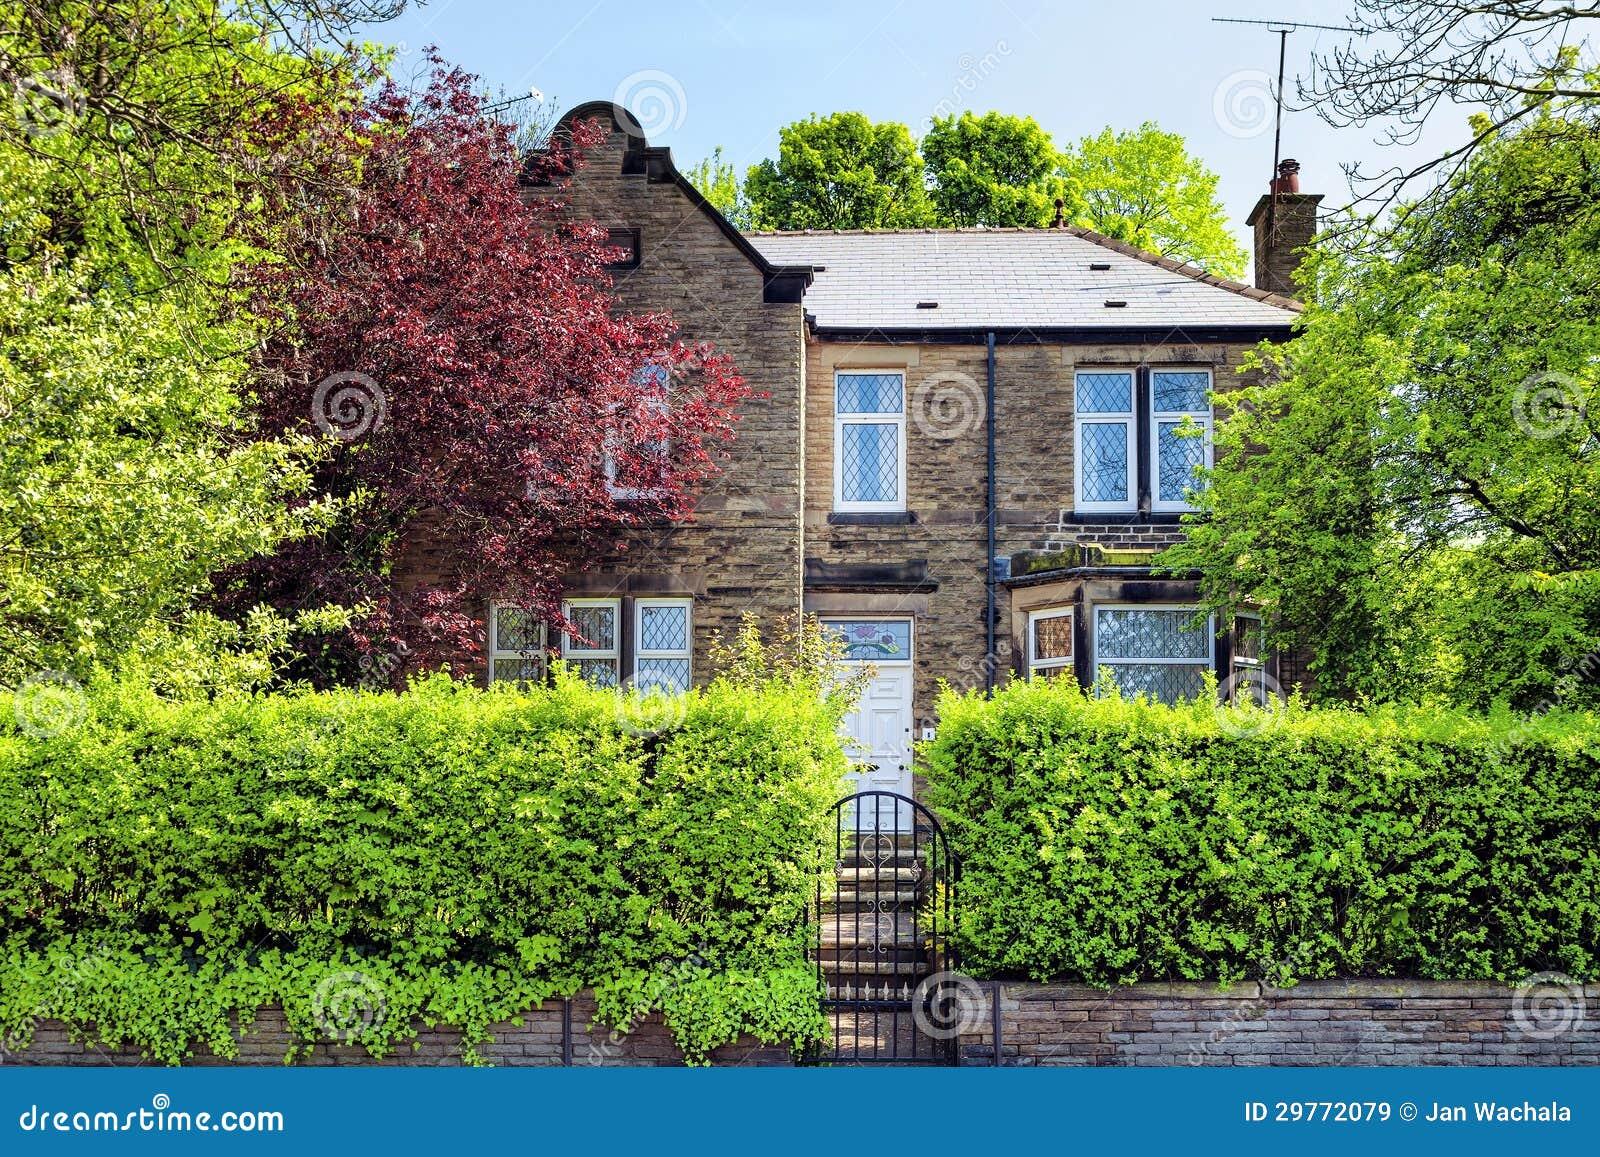 Une maison anglaise typique image stock image 29772079 for Maison anglaise typique plan